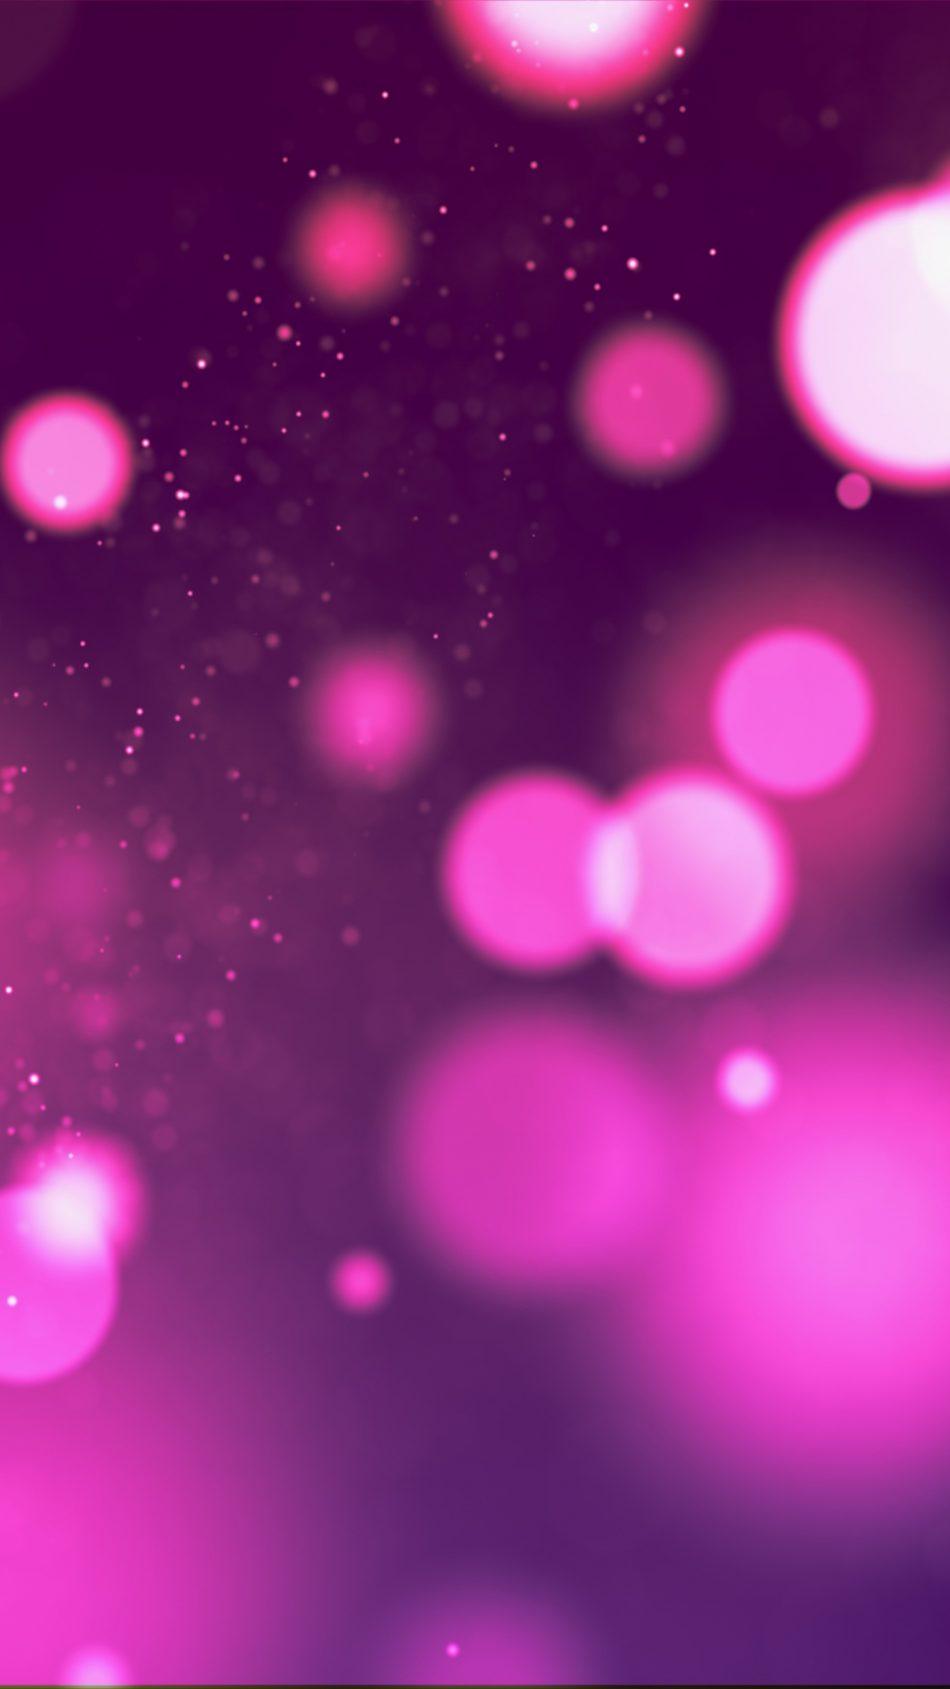 Download Bokeh Purple Pink Lights Free Pure 4k Ultra Hd